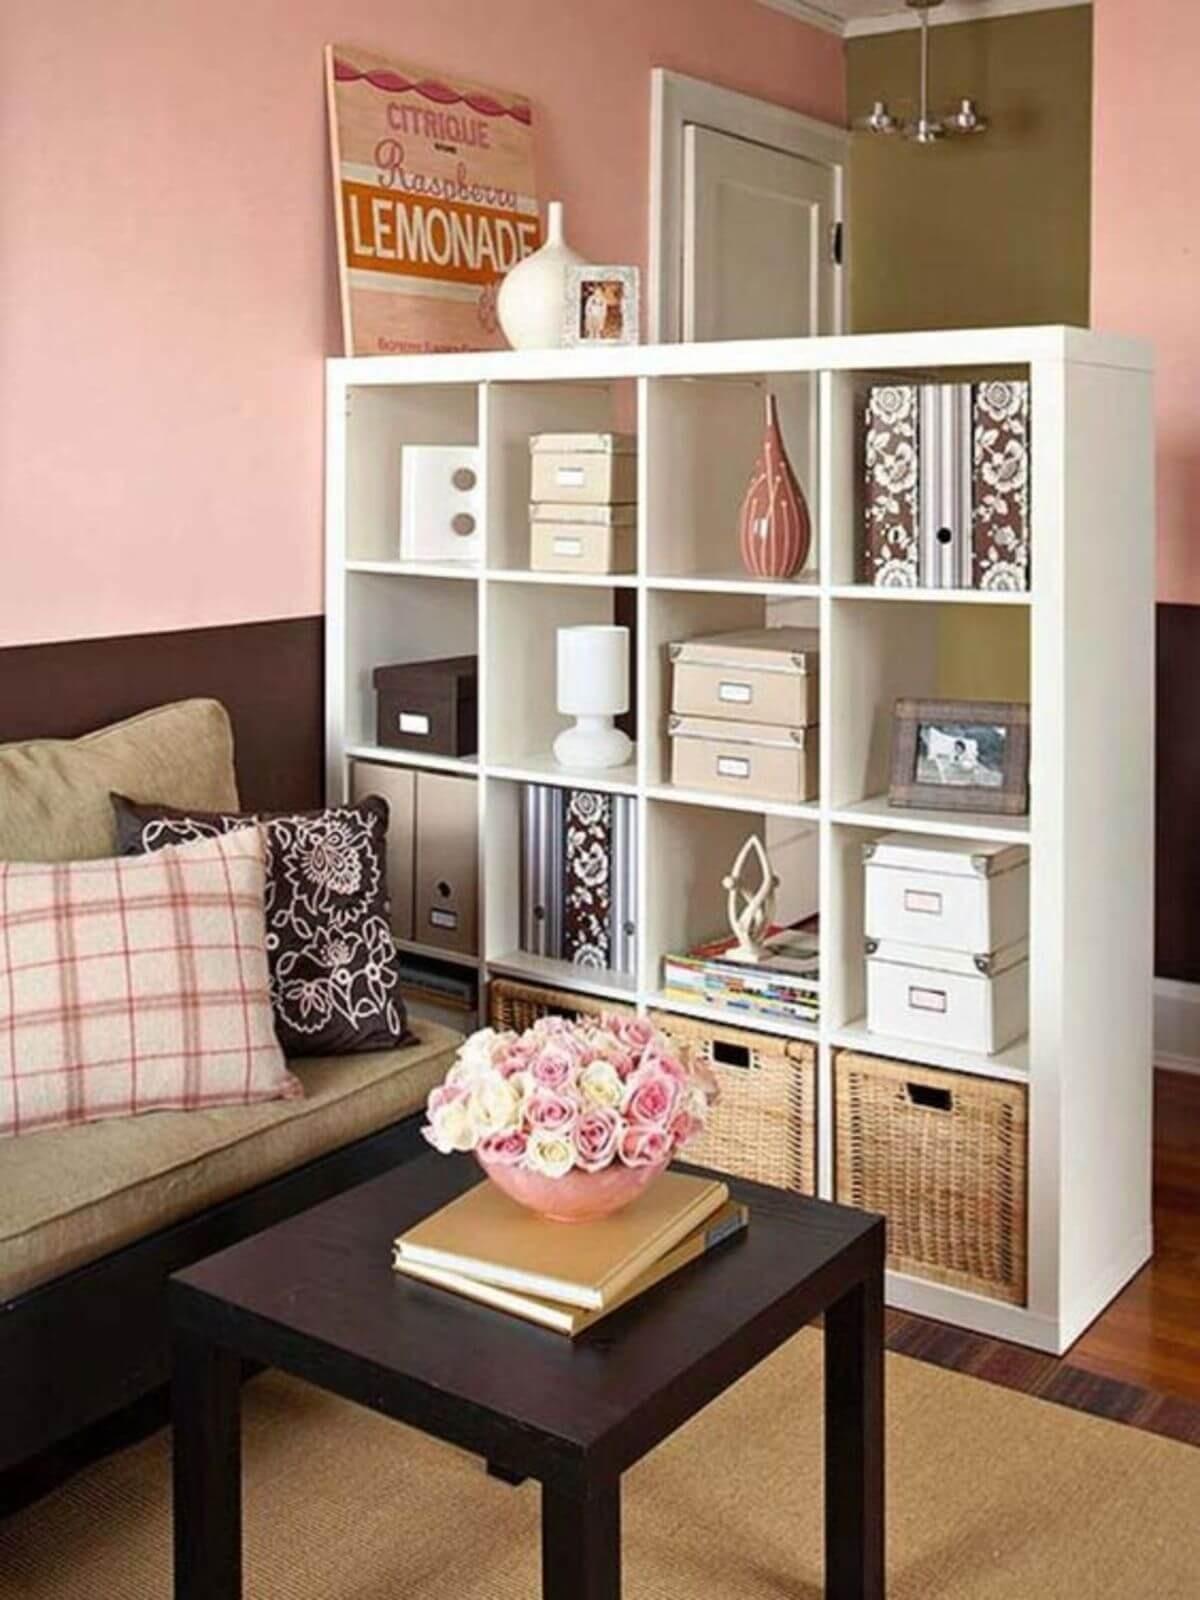 Living Room Shelving Units